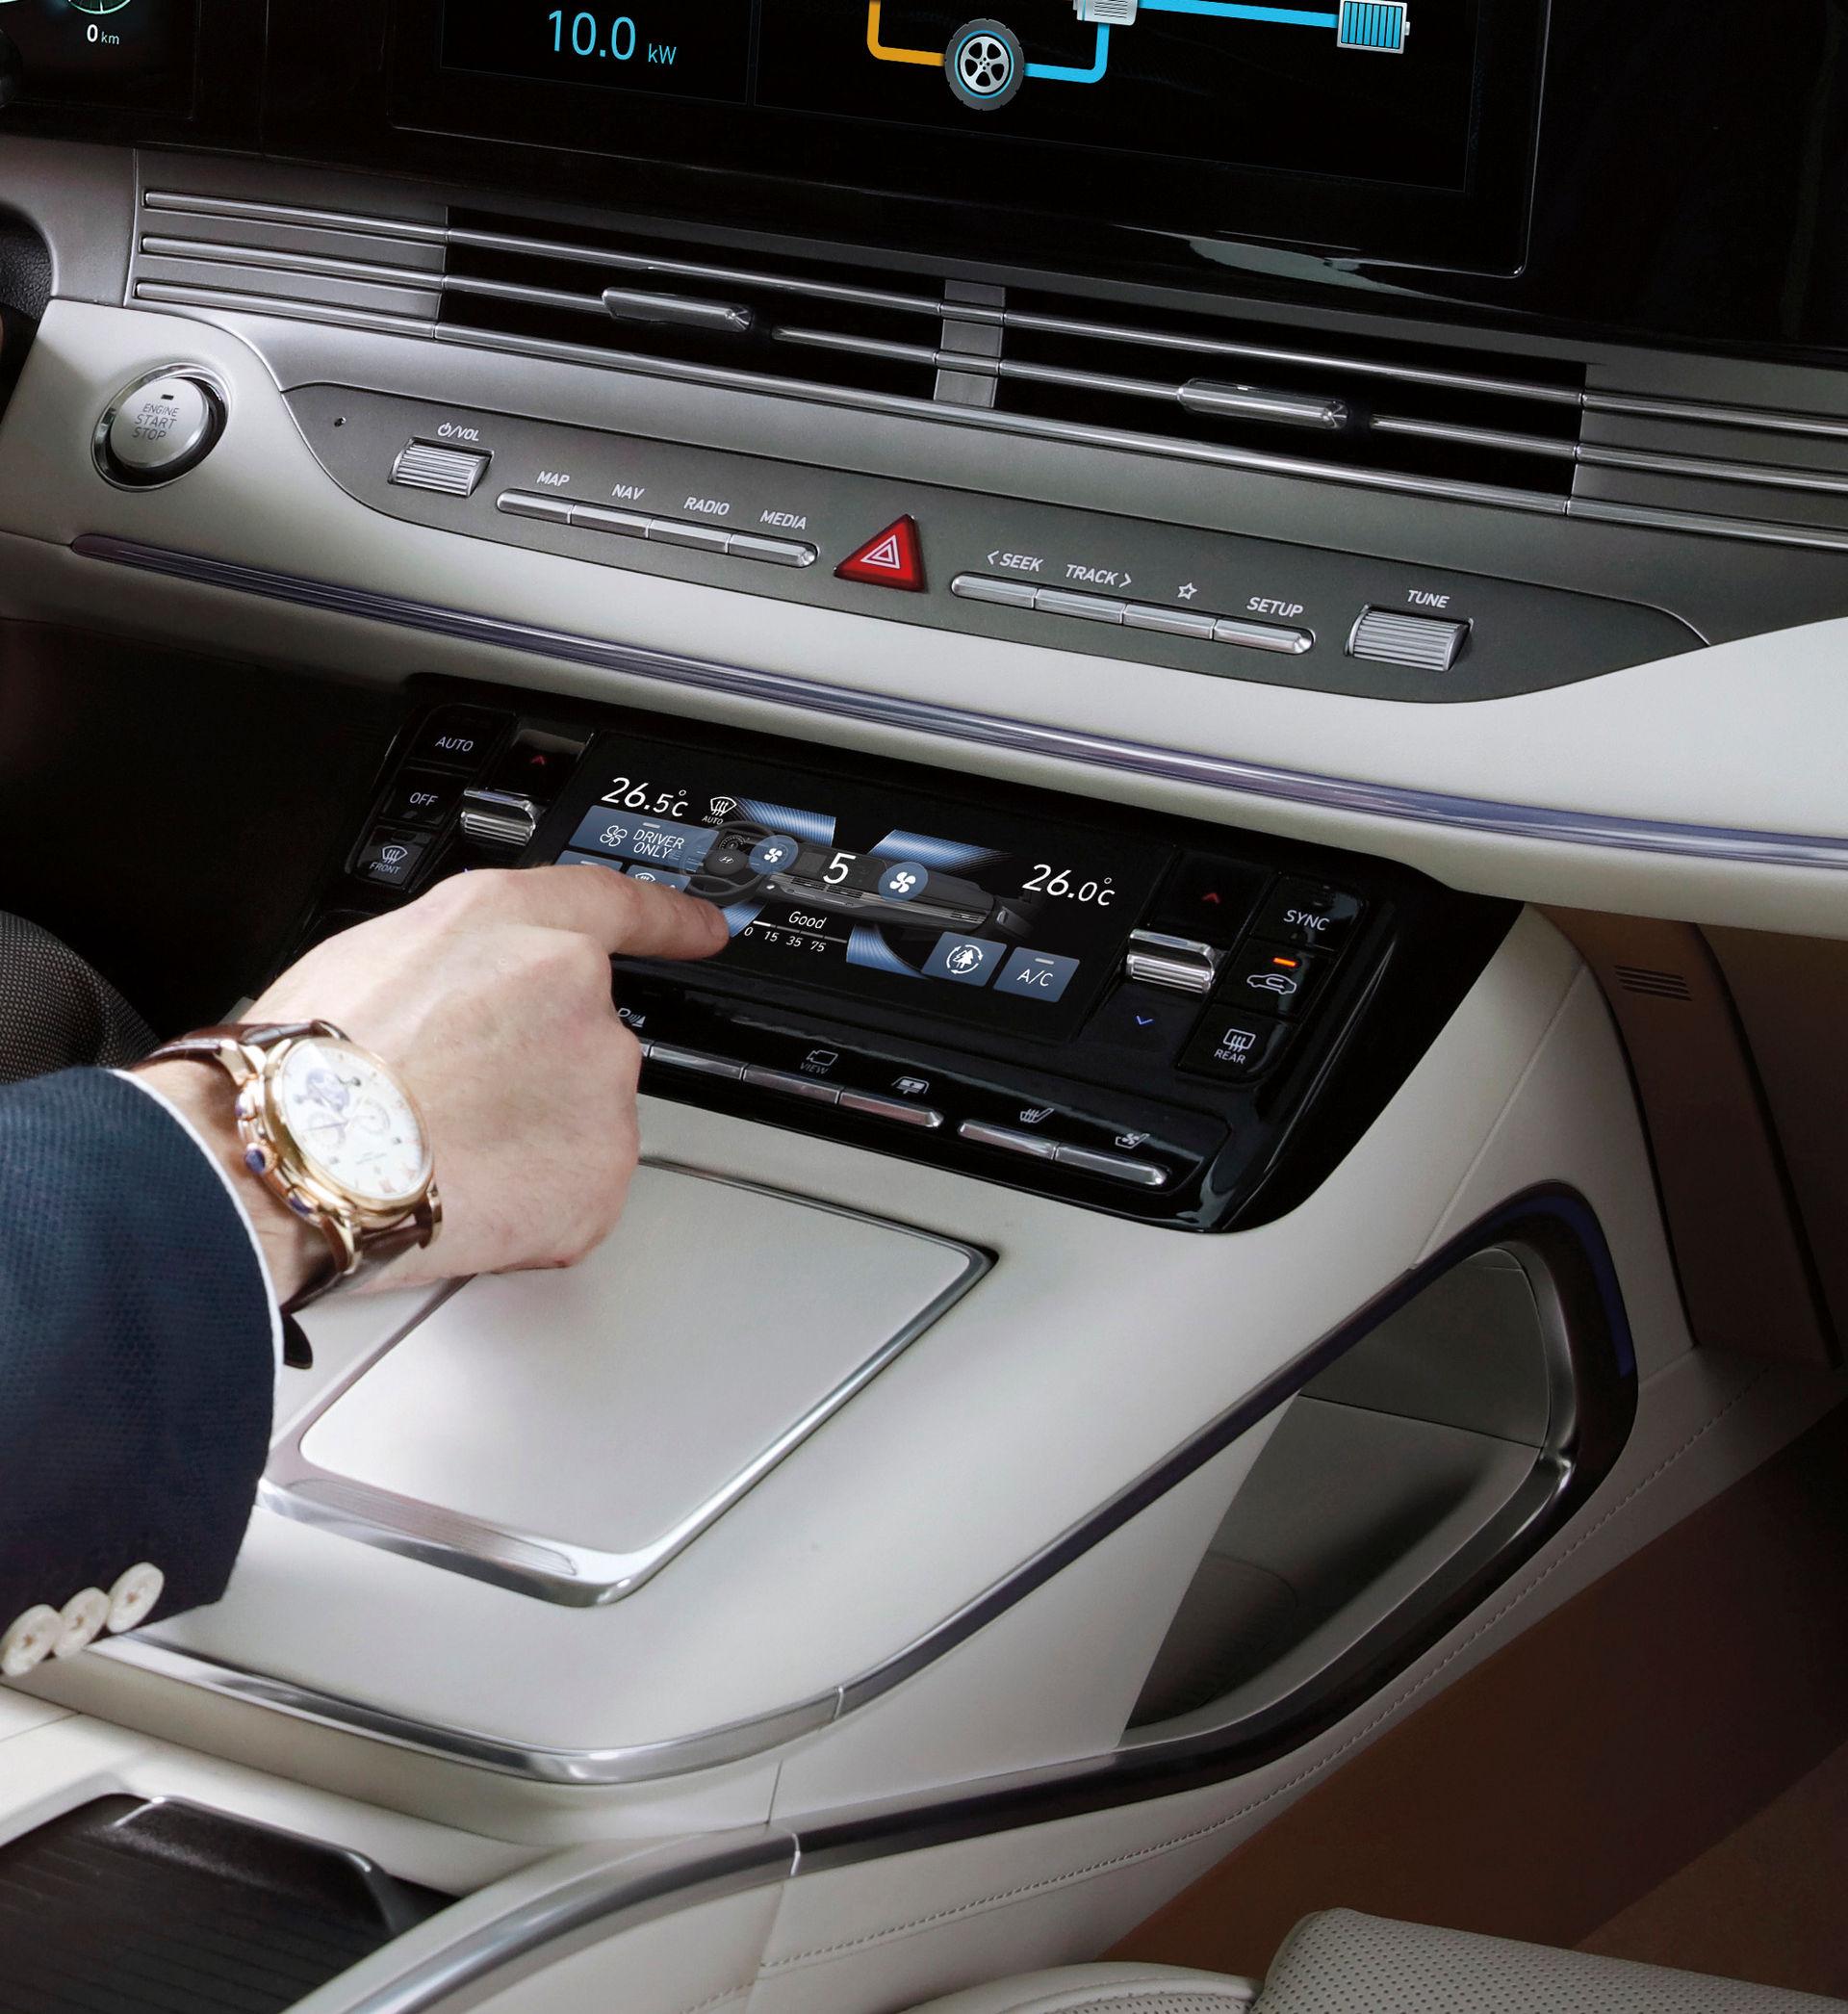 Hyundai-Air-Conditioning-system-clima-10